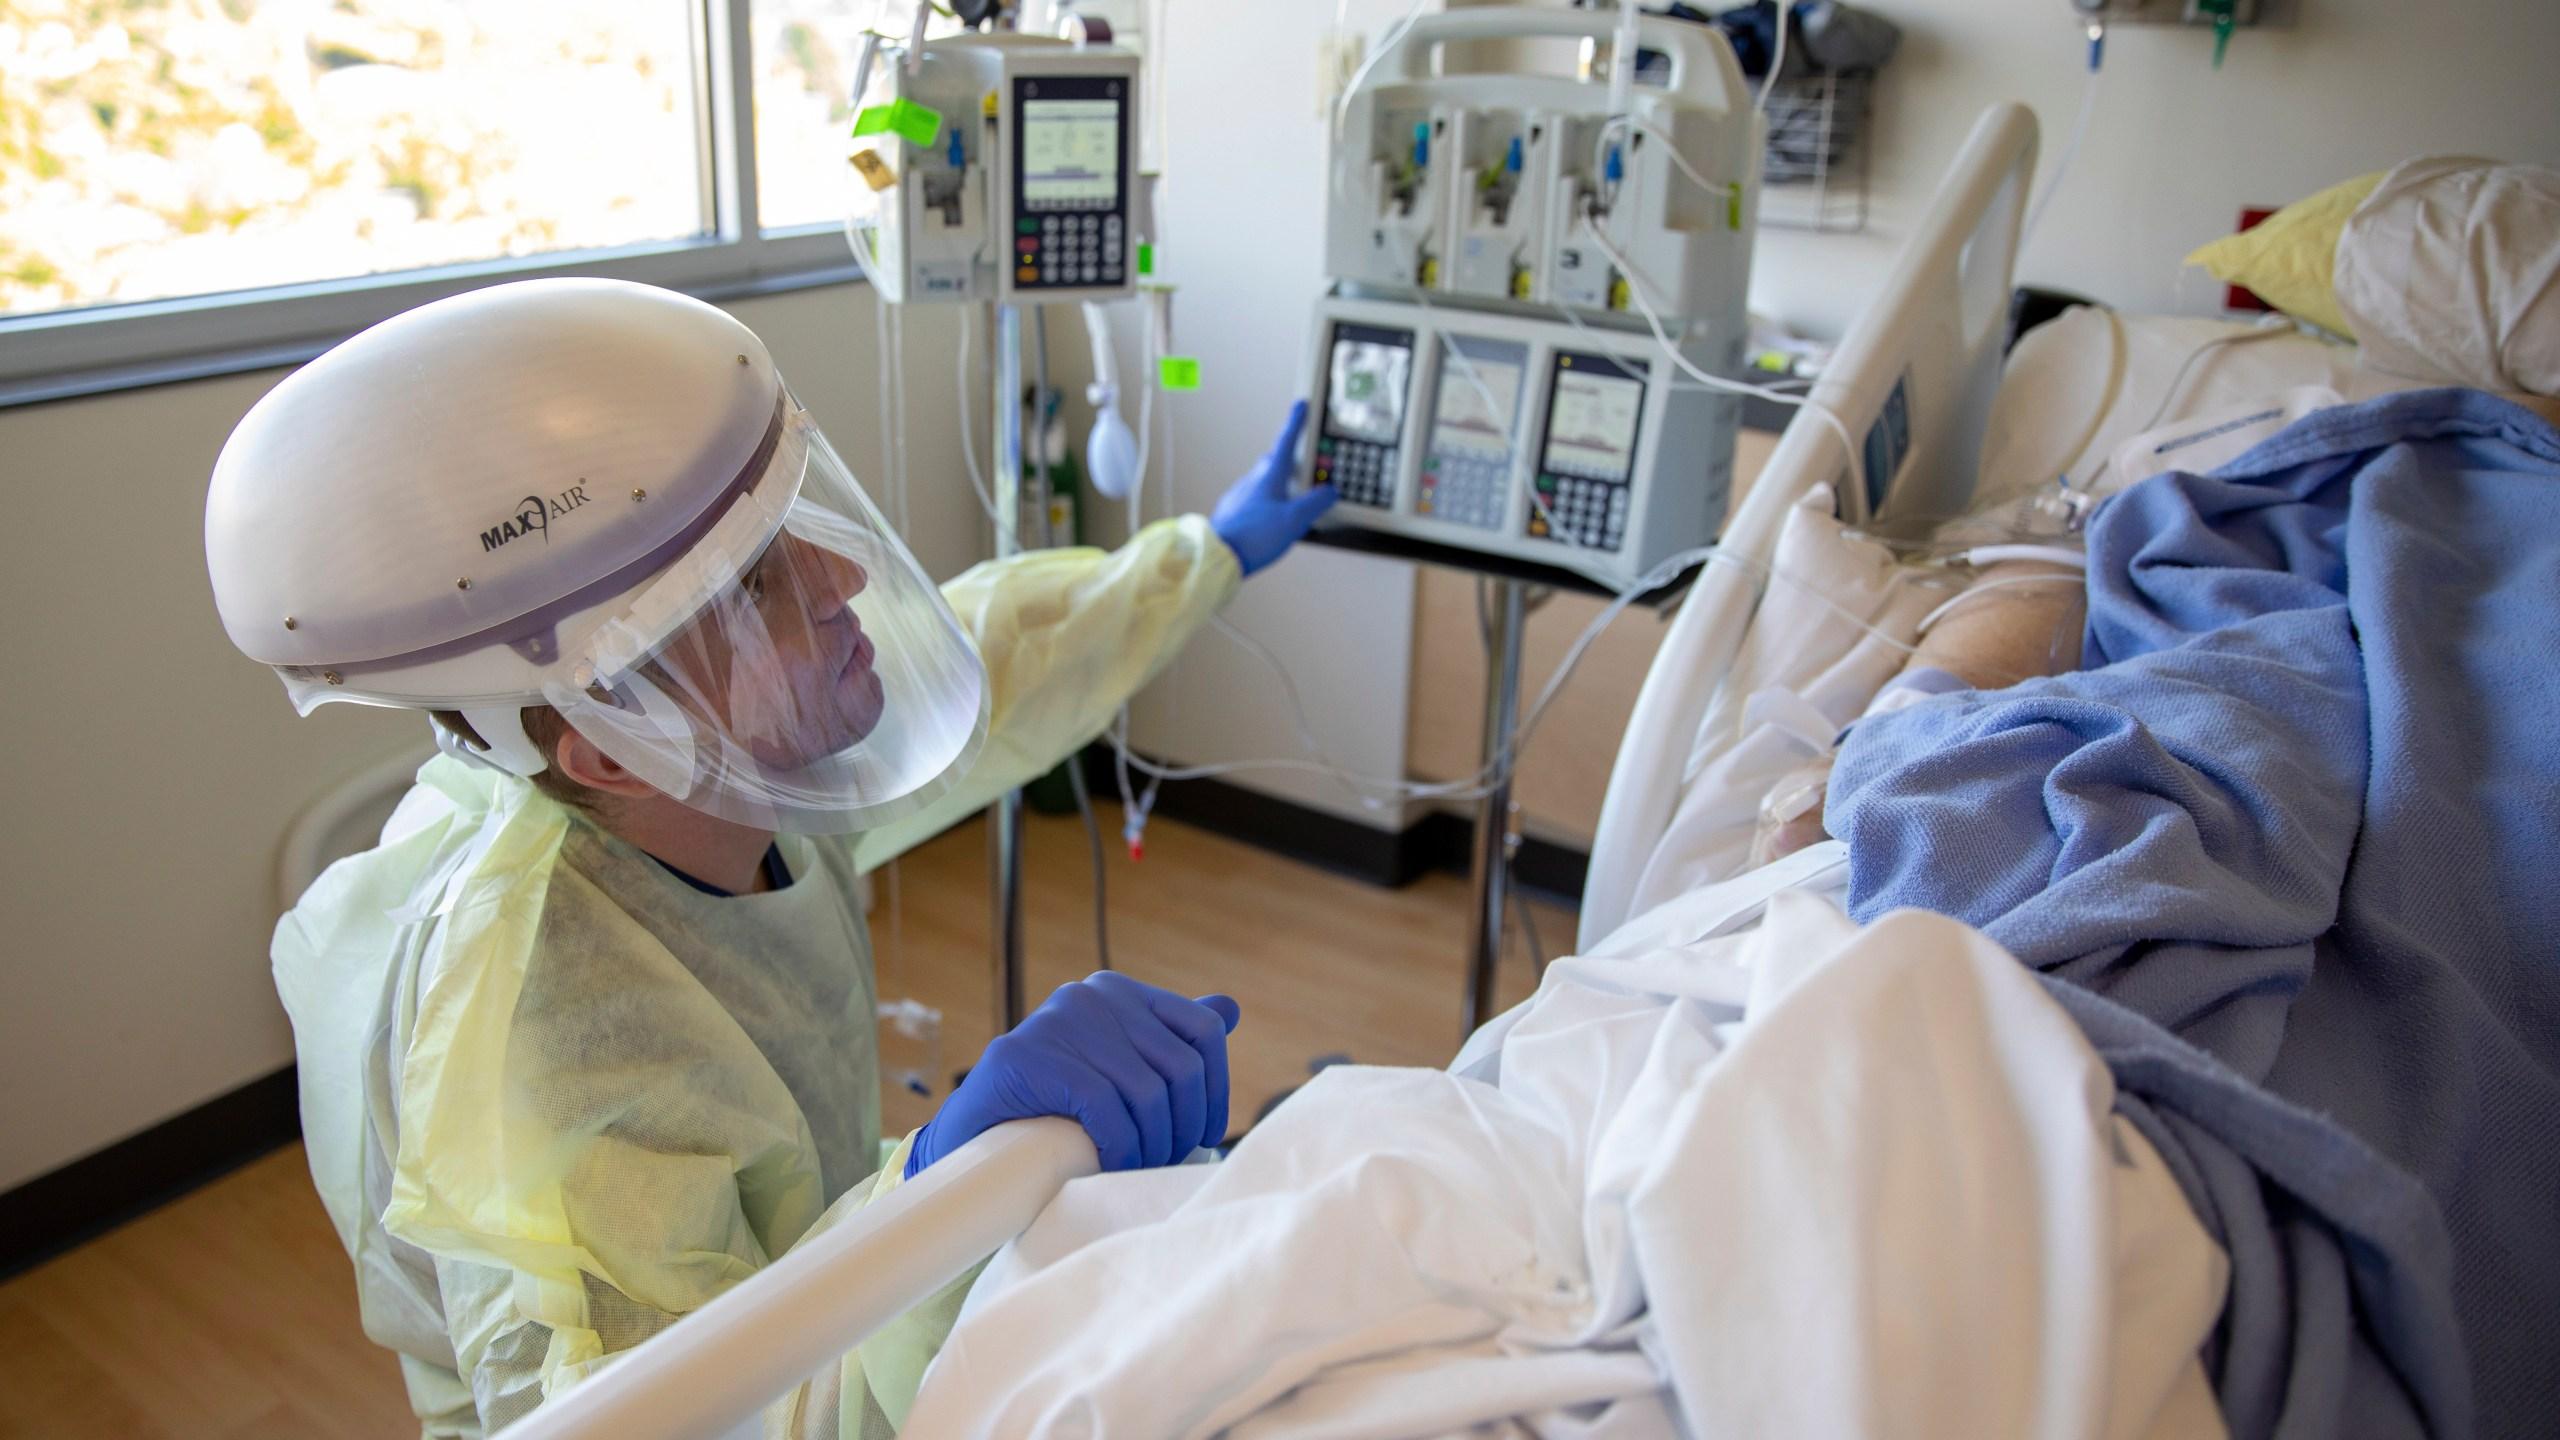 U.S. Army Medical Response Team Work With Idaho Hospital Staff